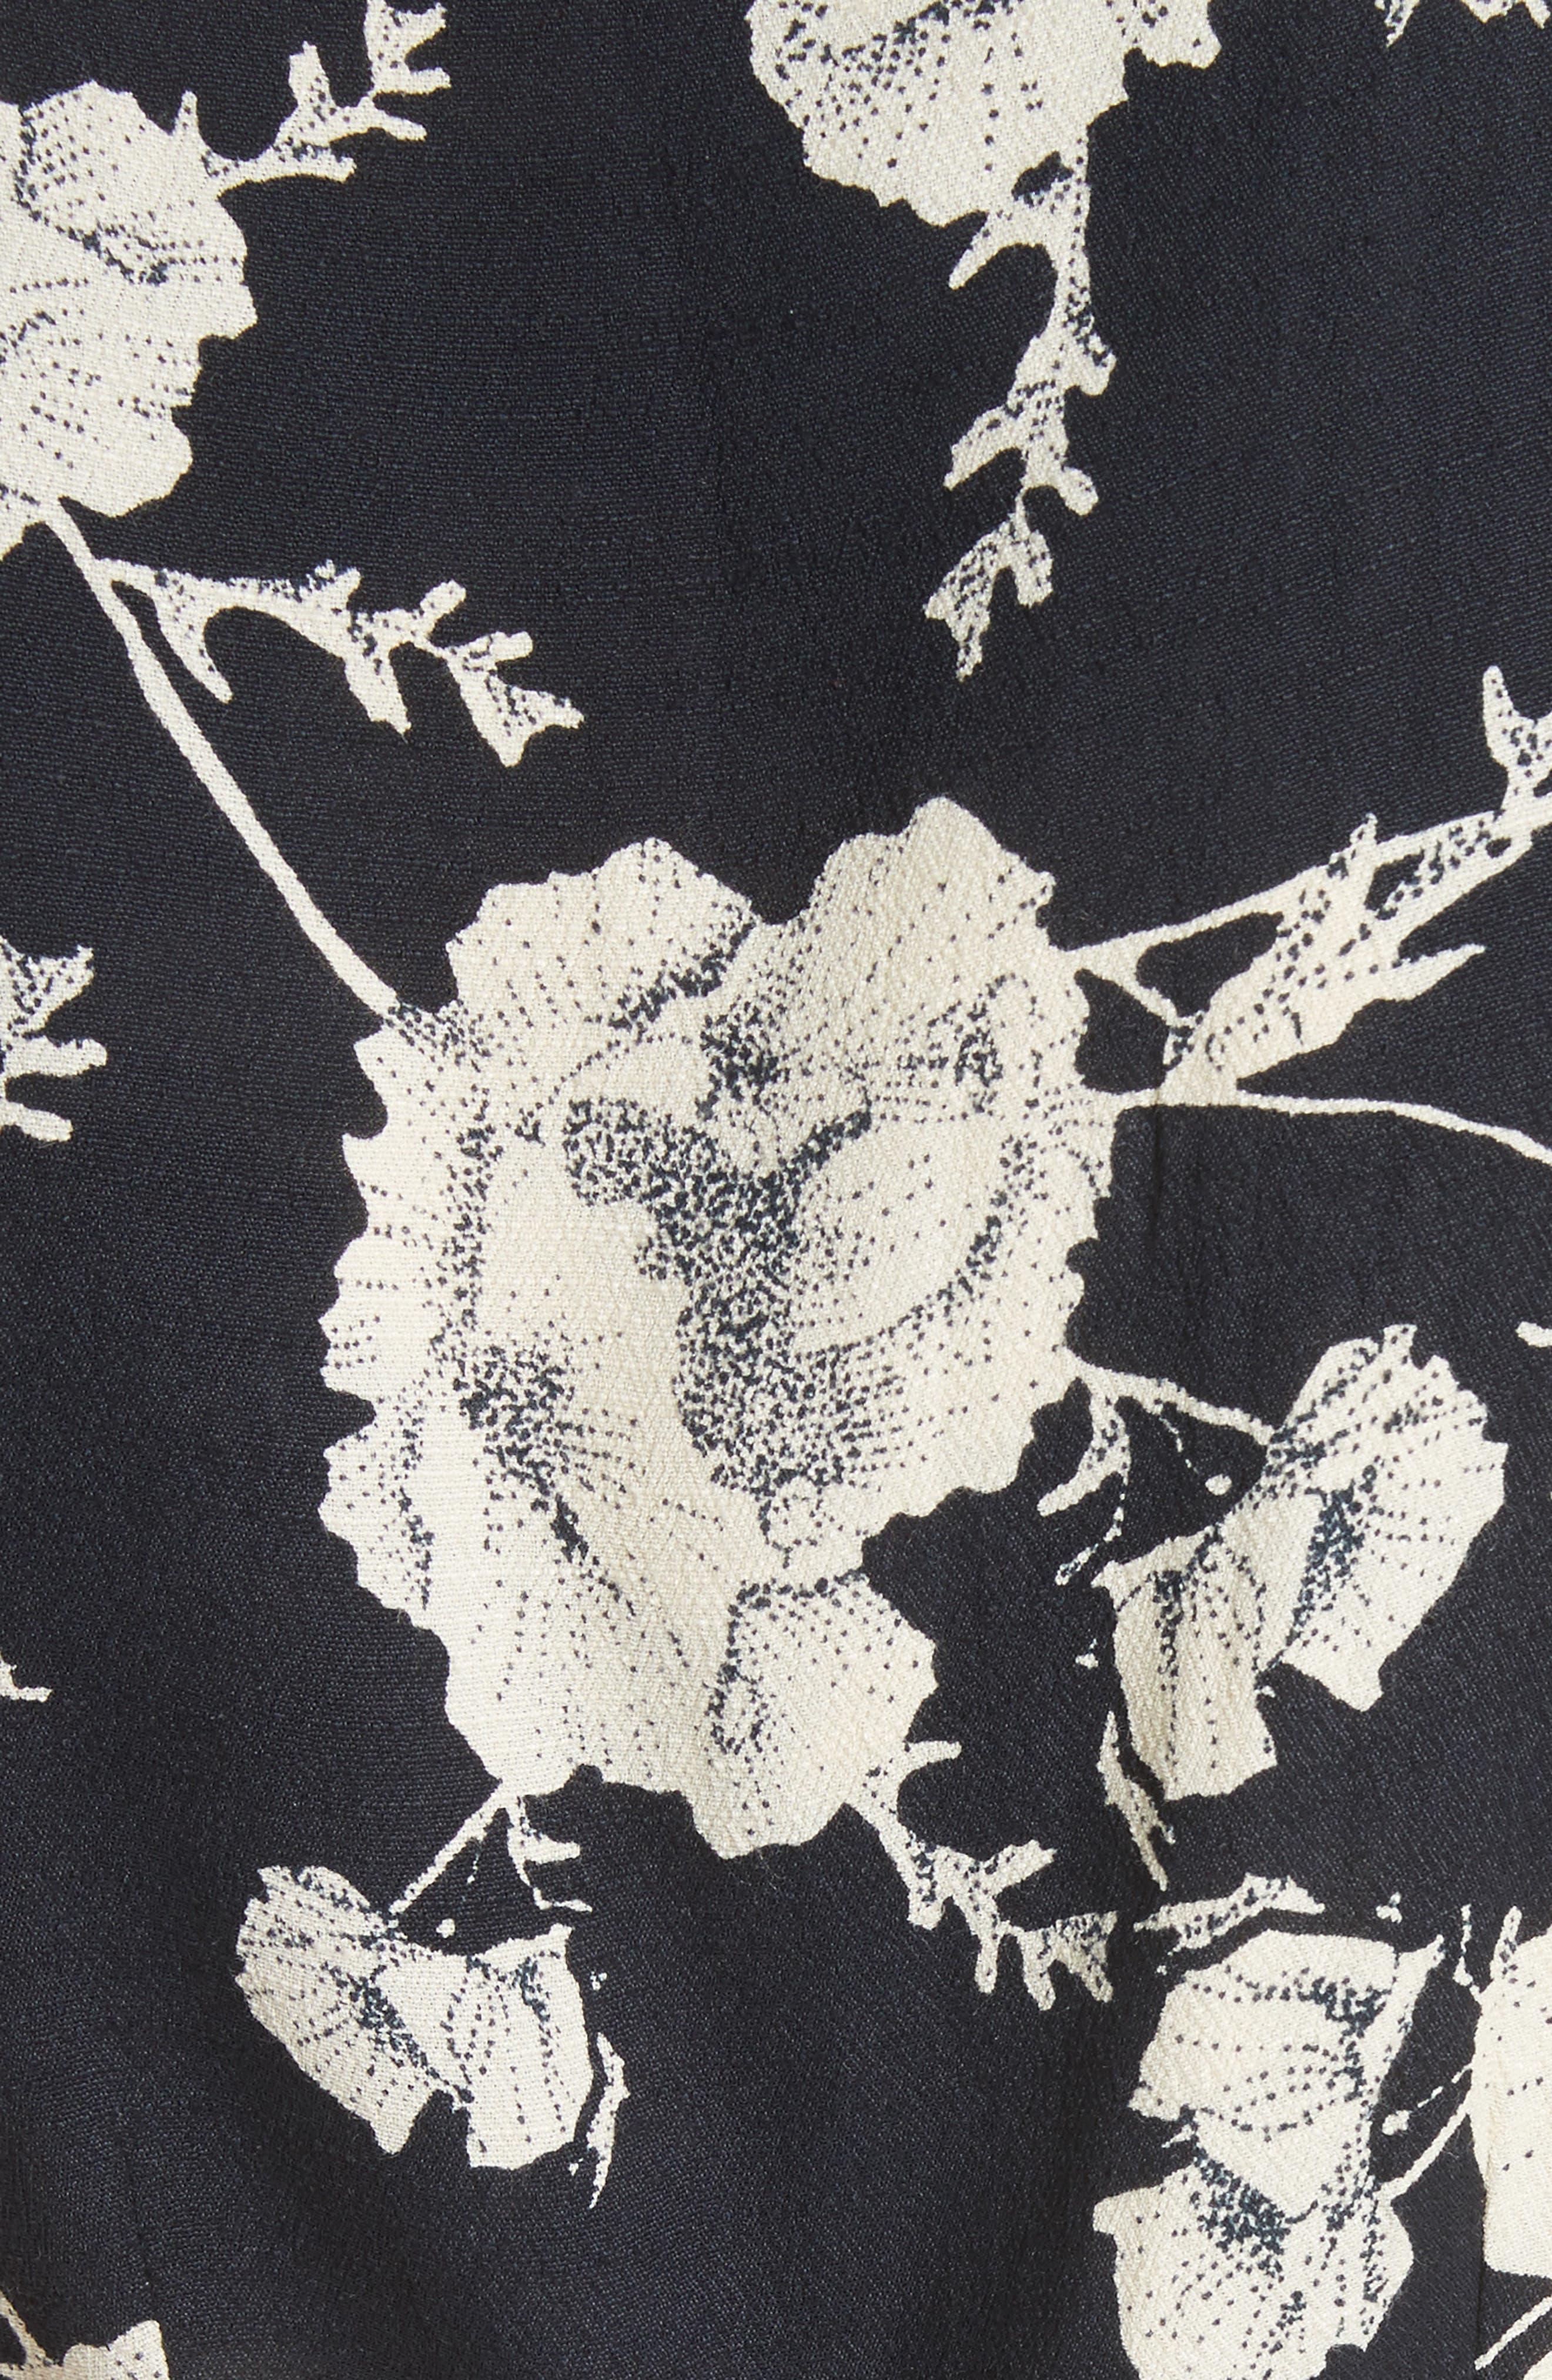 French Quarter Print Wrap Minidress,                             Alternate thumbnail 6, color,                             001